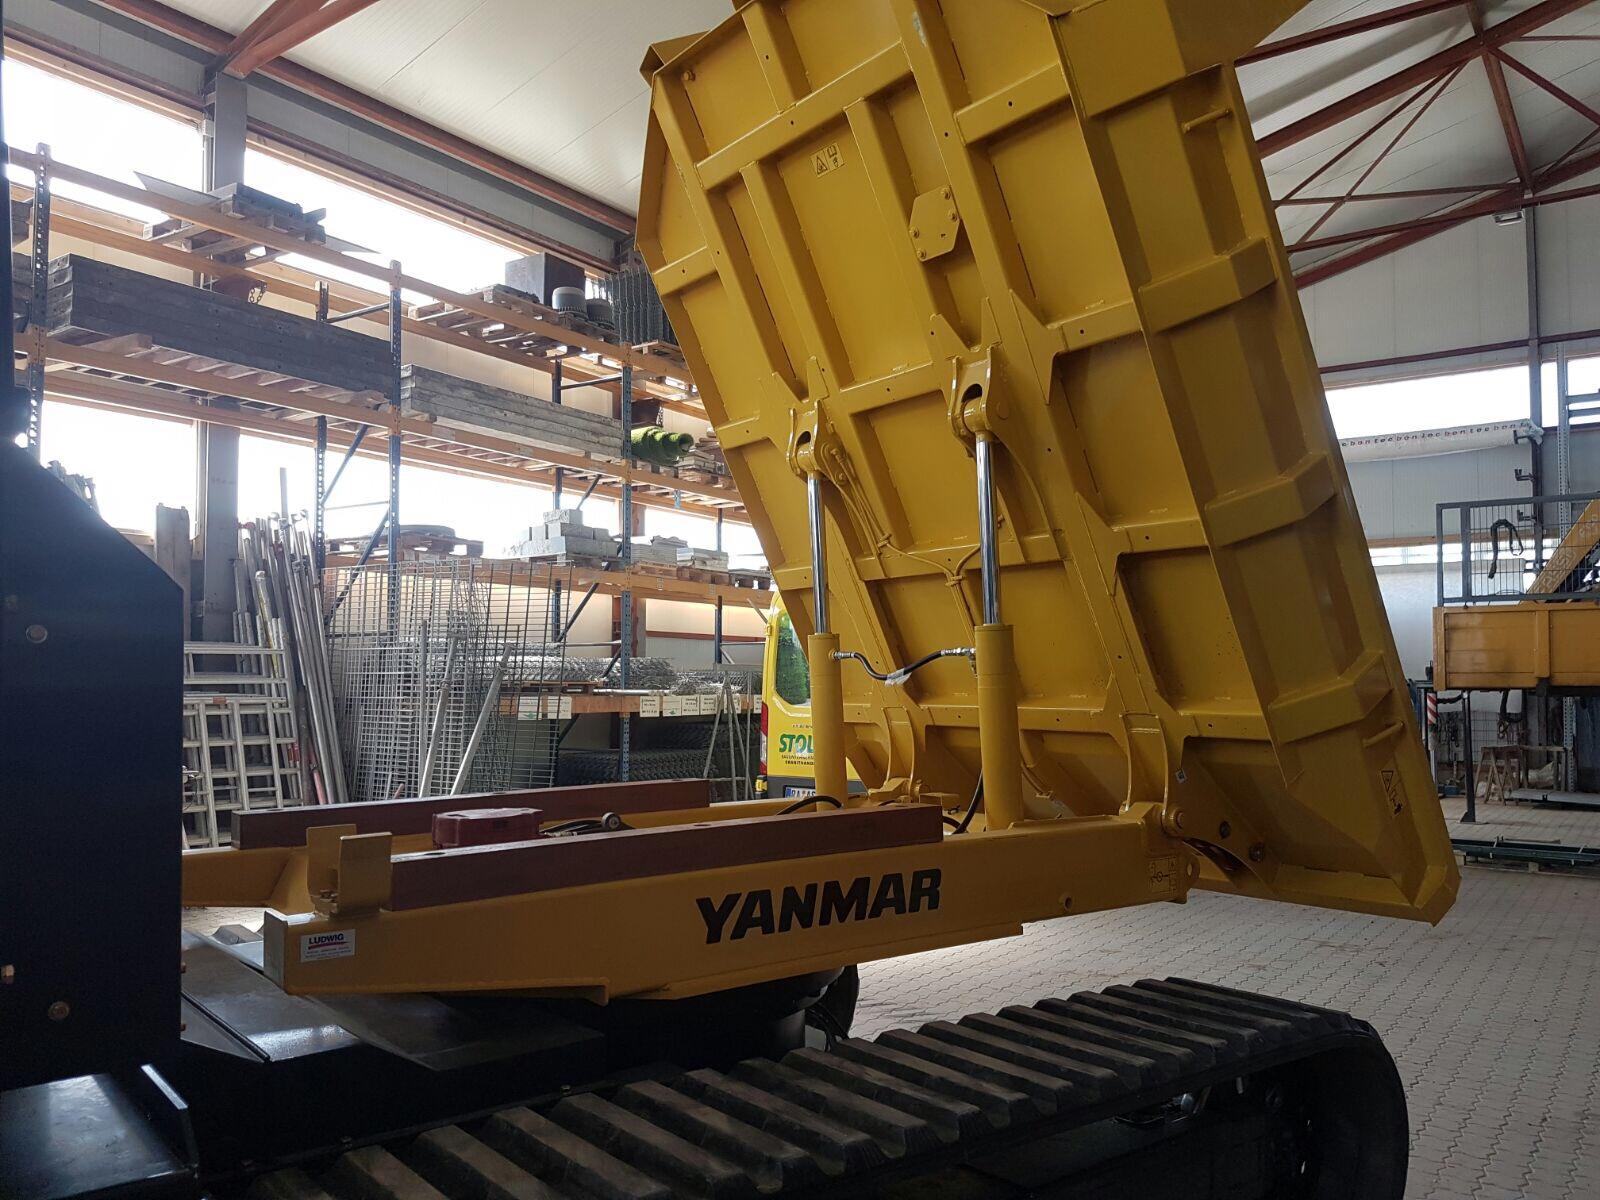 Yanmar Raupendumper - Stolz GmbH Bauunternehmung - Mietservice